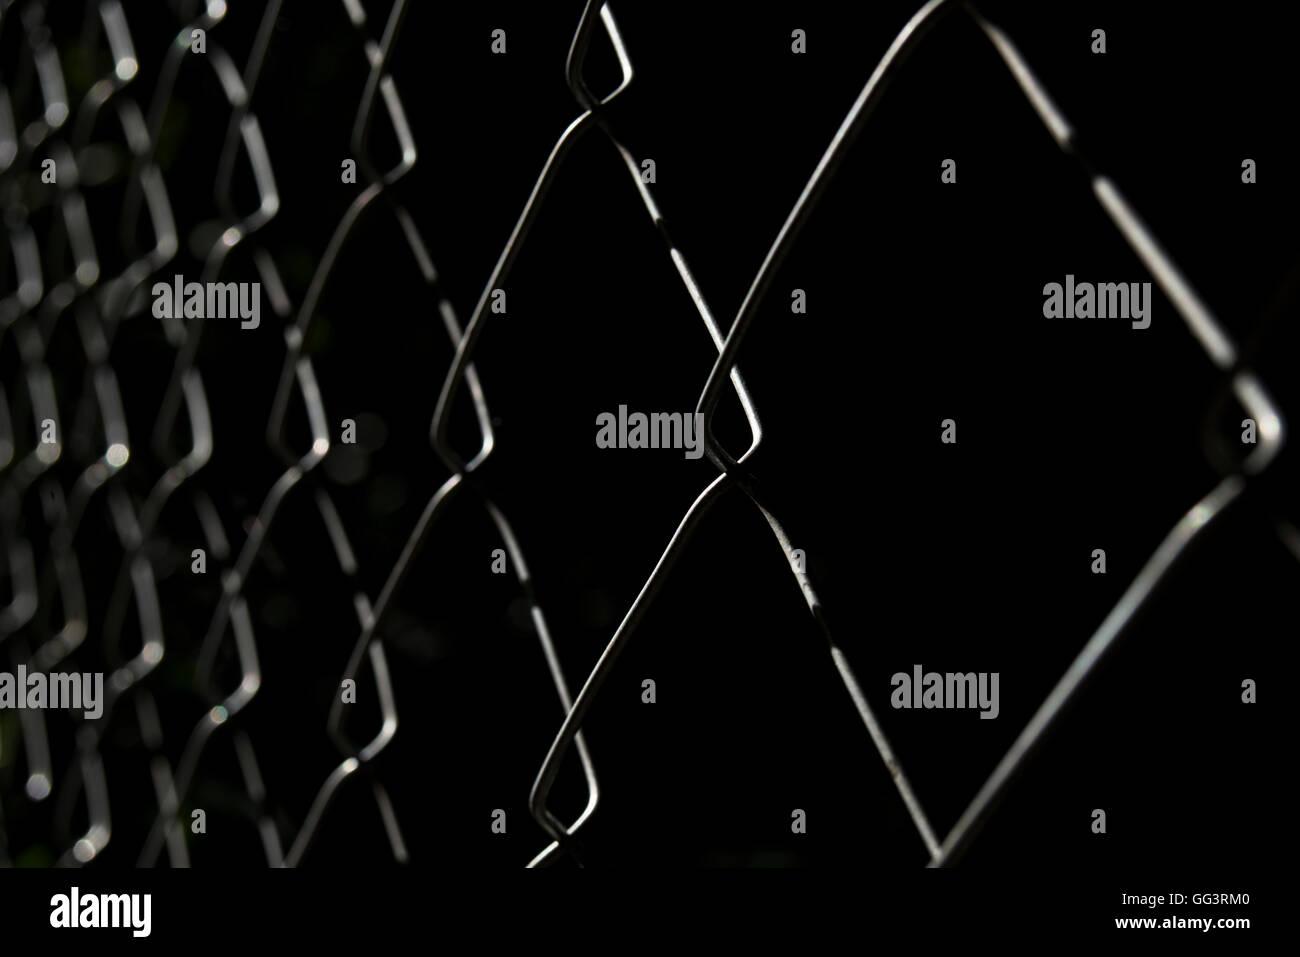 Metal Mesh Wire Closeup Black Stockfotos & Metal Mesh Wire Closeup ...